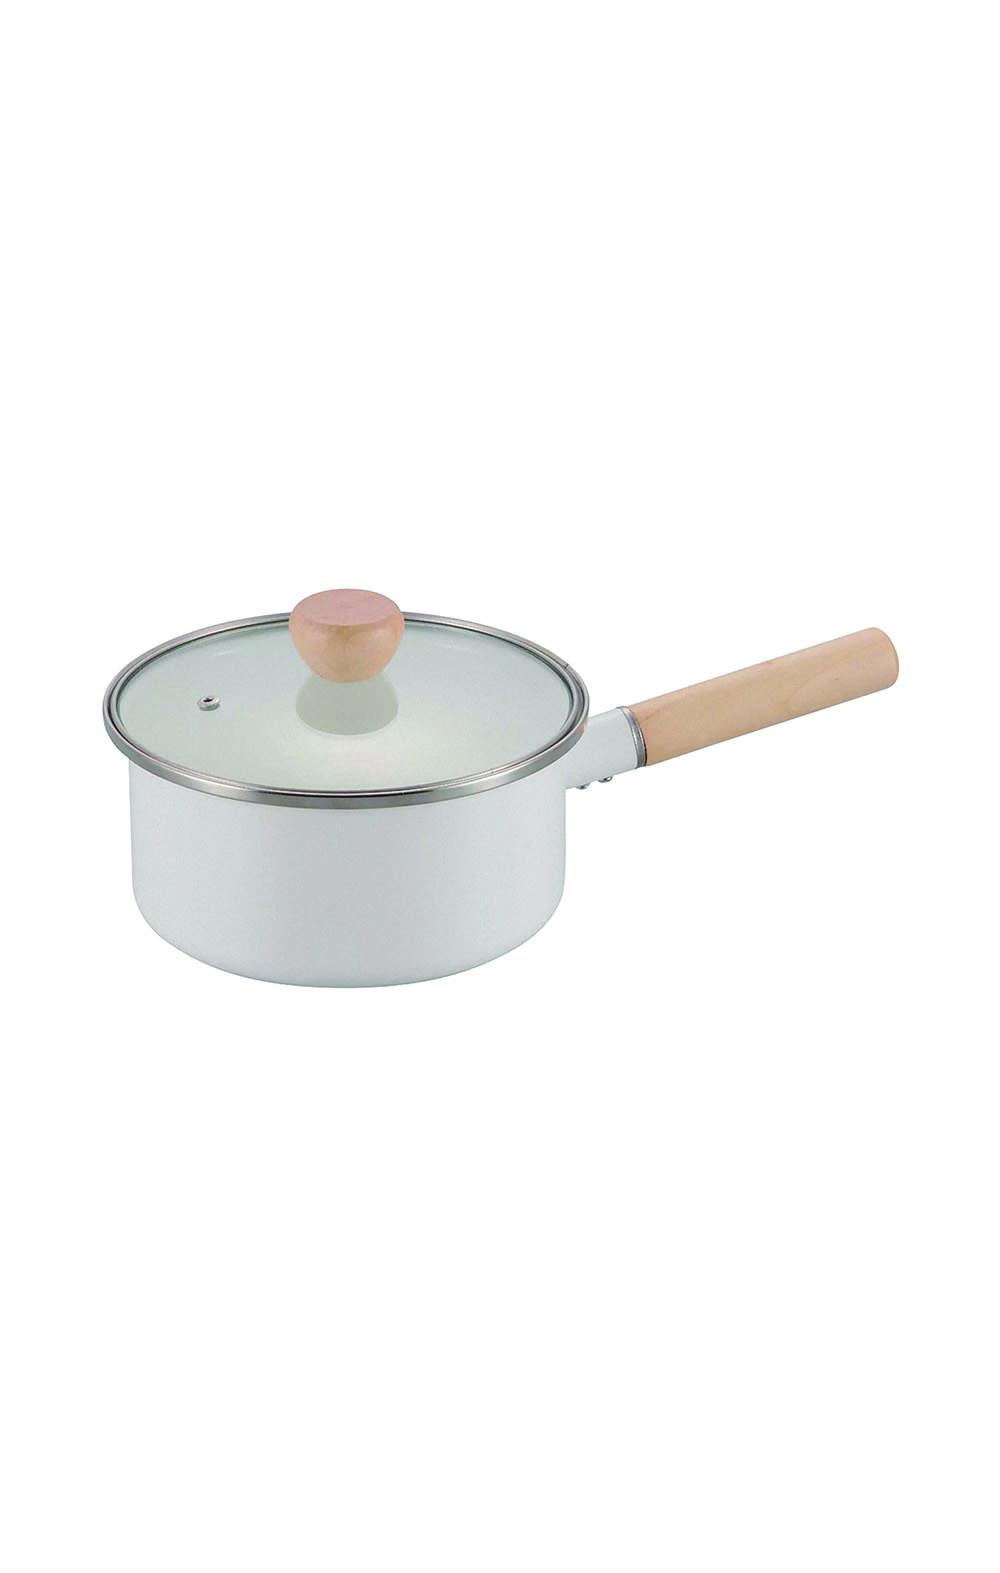 Pearl Metal HB-4943 Single Handed Pot White 18 cm وعاء متعدد الأستخدام